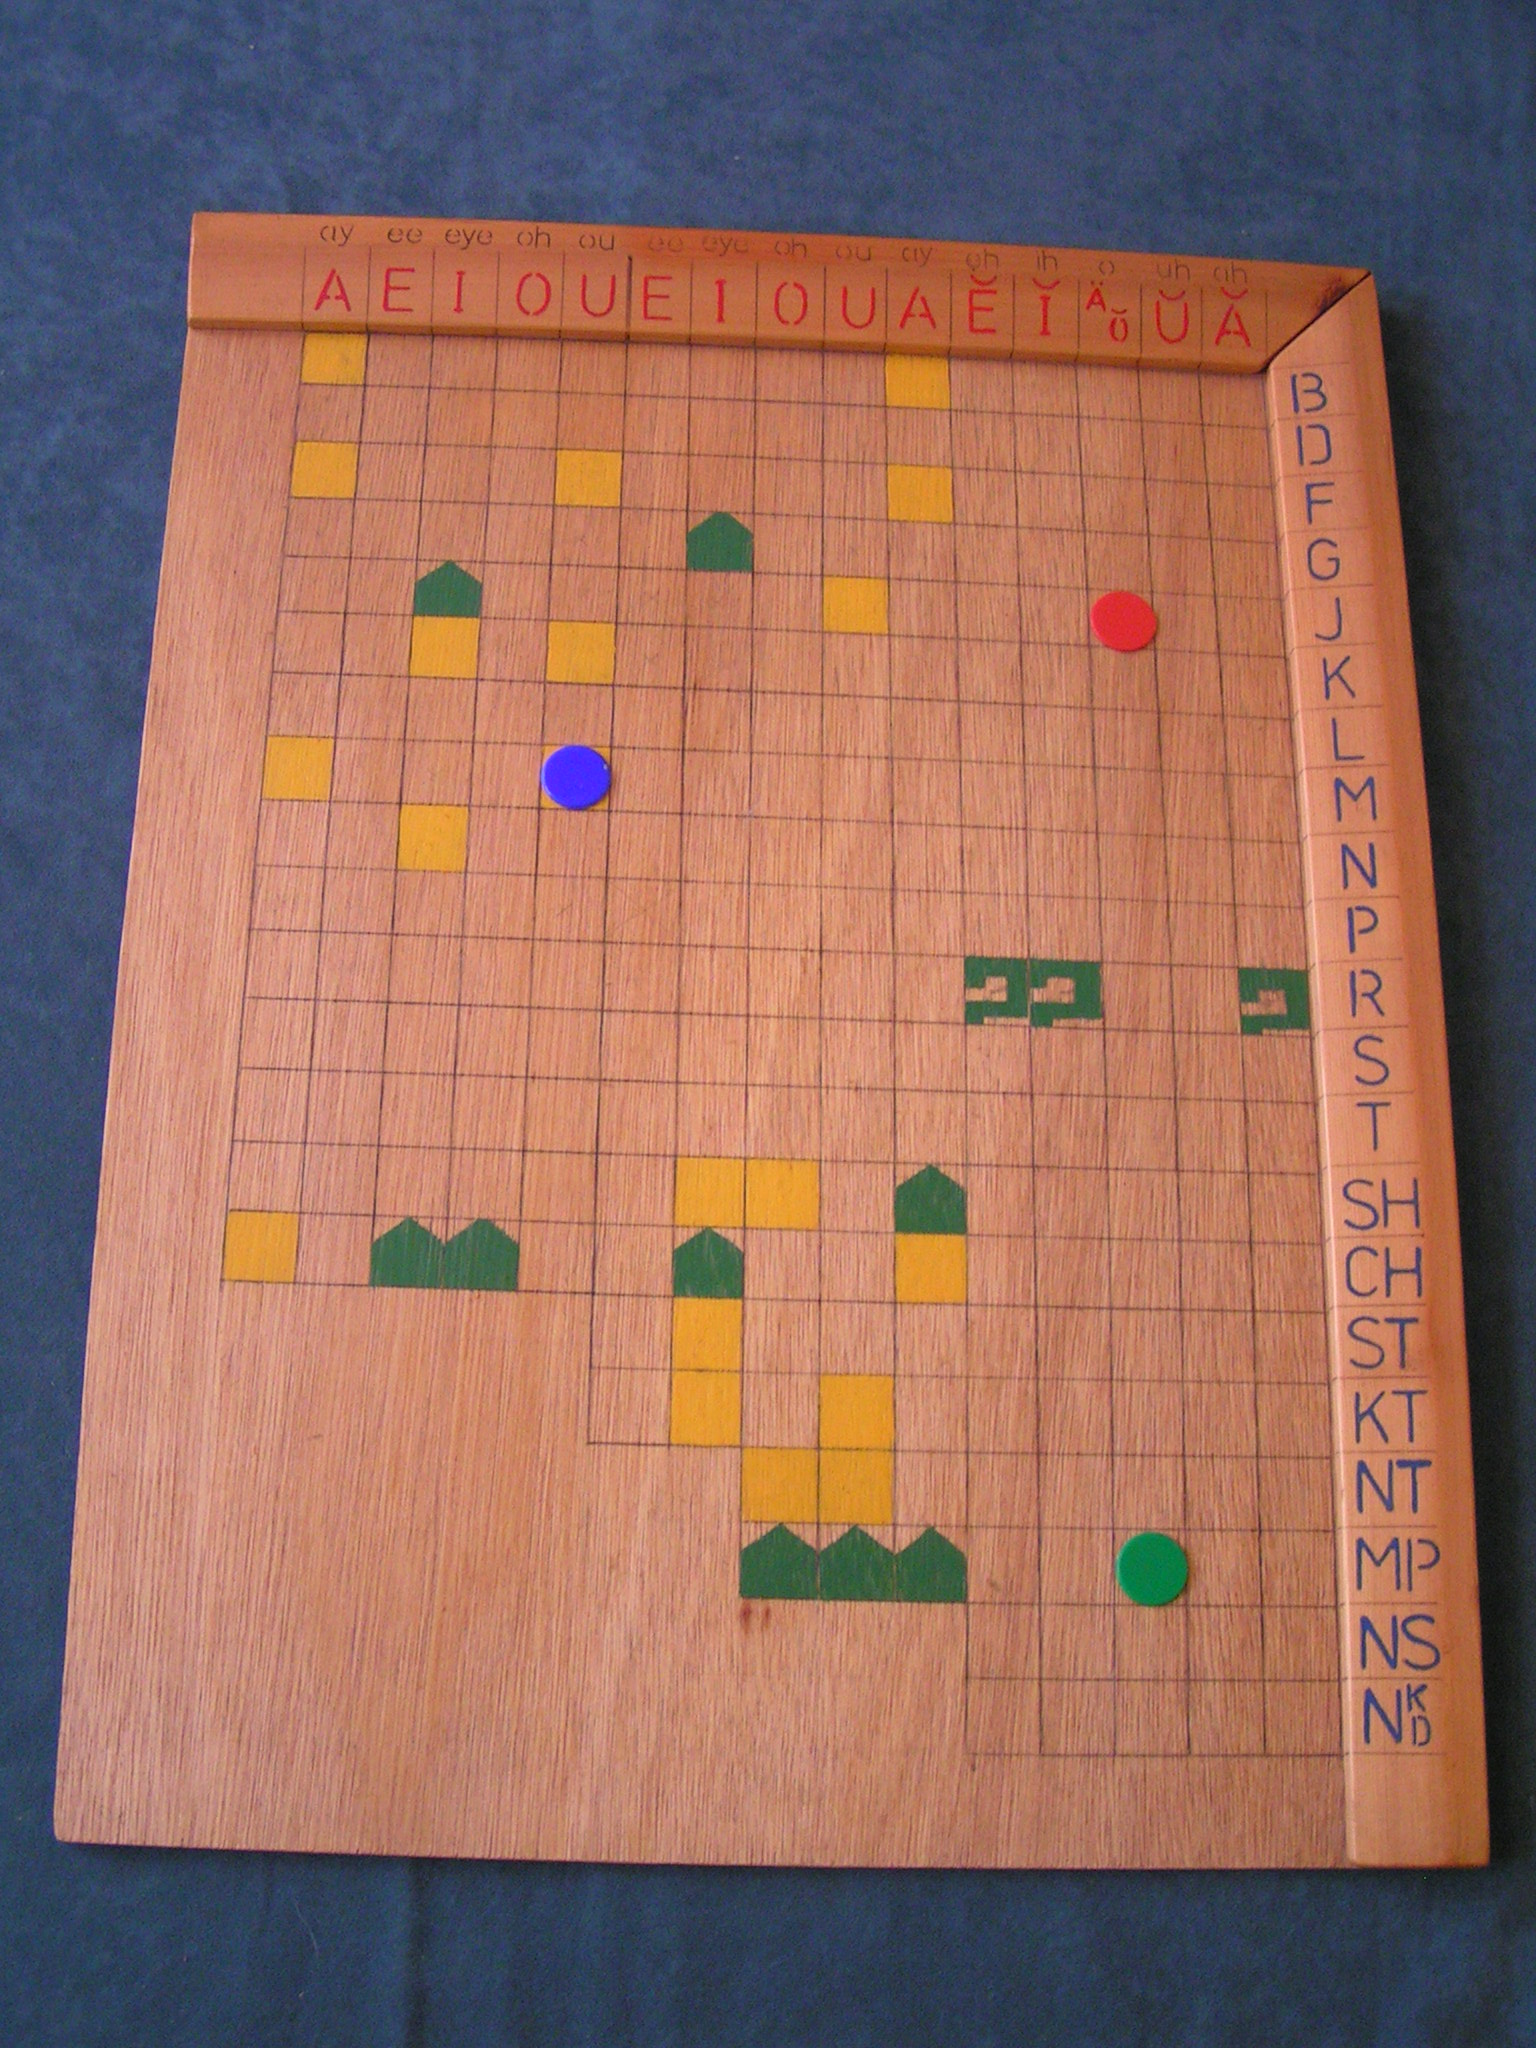 The Rhyme Board